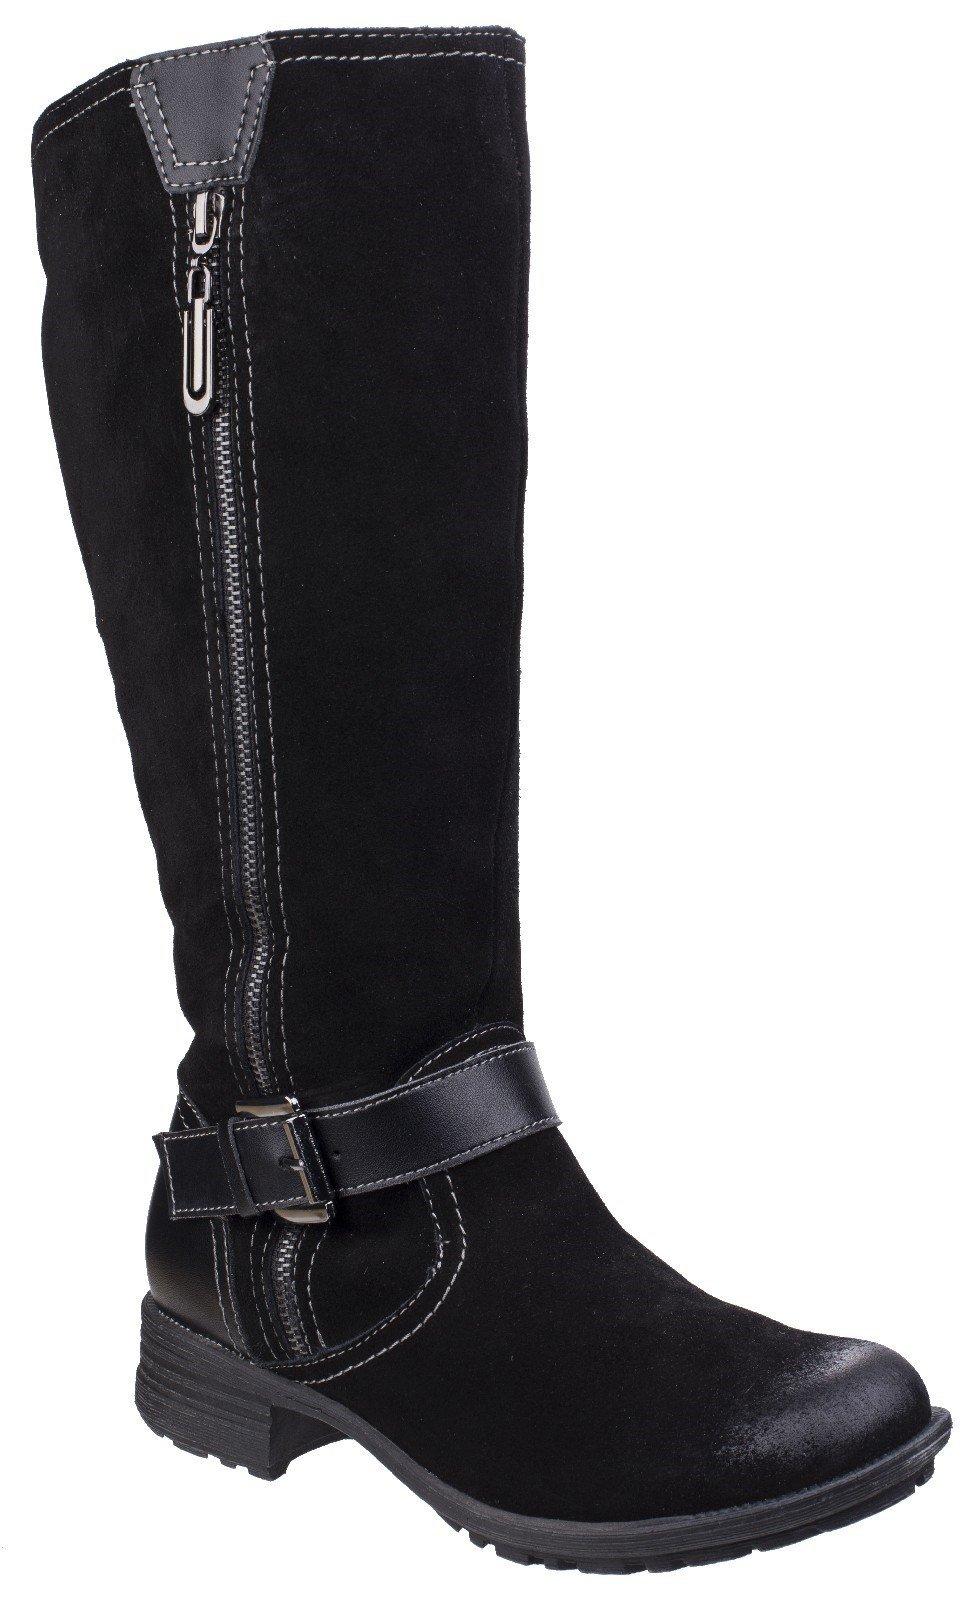 Fleet & Foster Women's Tokyo Long Boot Black 25556-42524 - Black 3